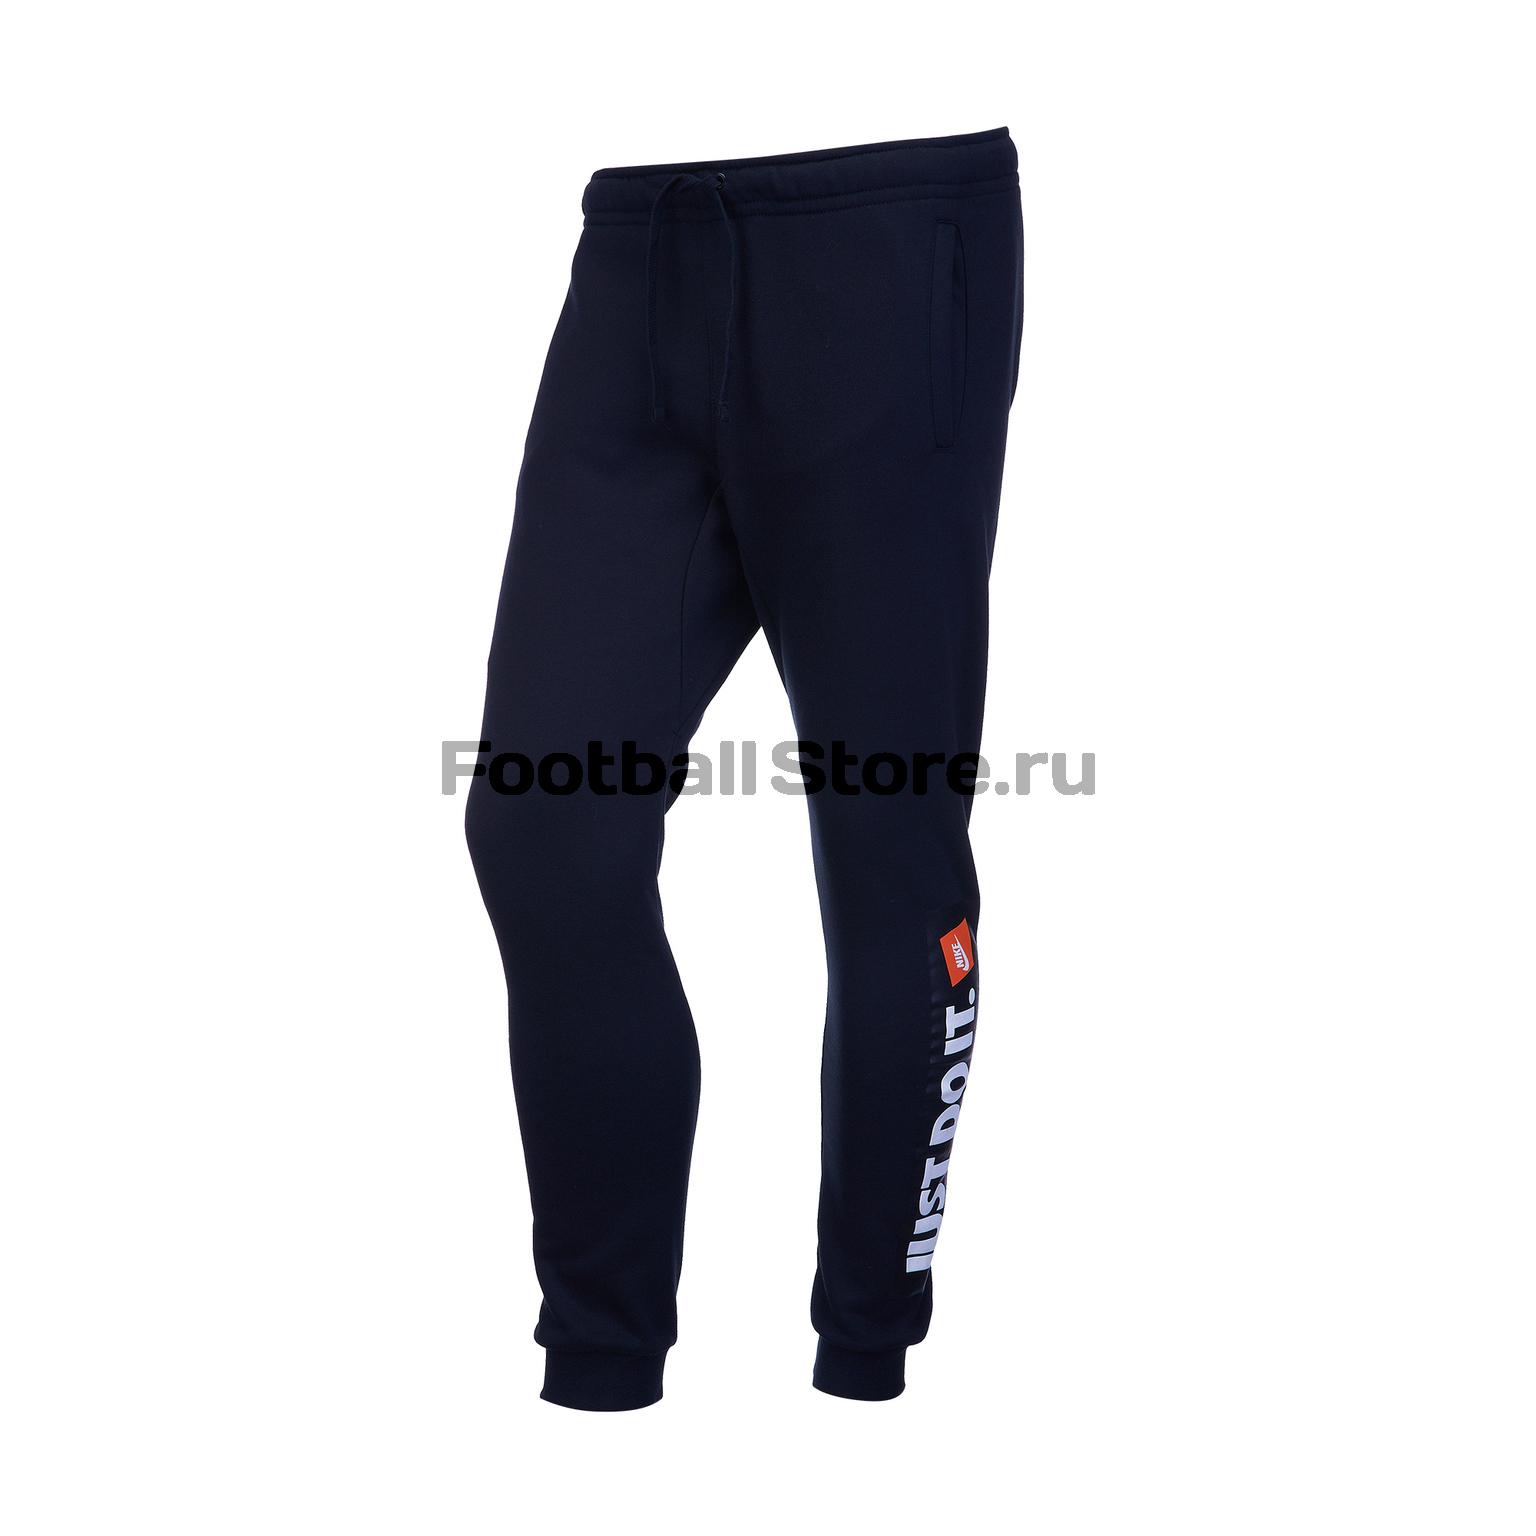 Брюки тренировочные Nike Just Do It NSW FLC 928725-010 бейсболки nike бейсболка nsw true blue lbl kashi